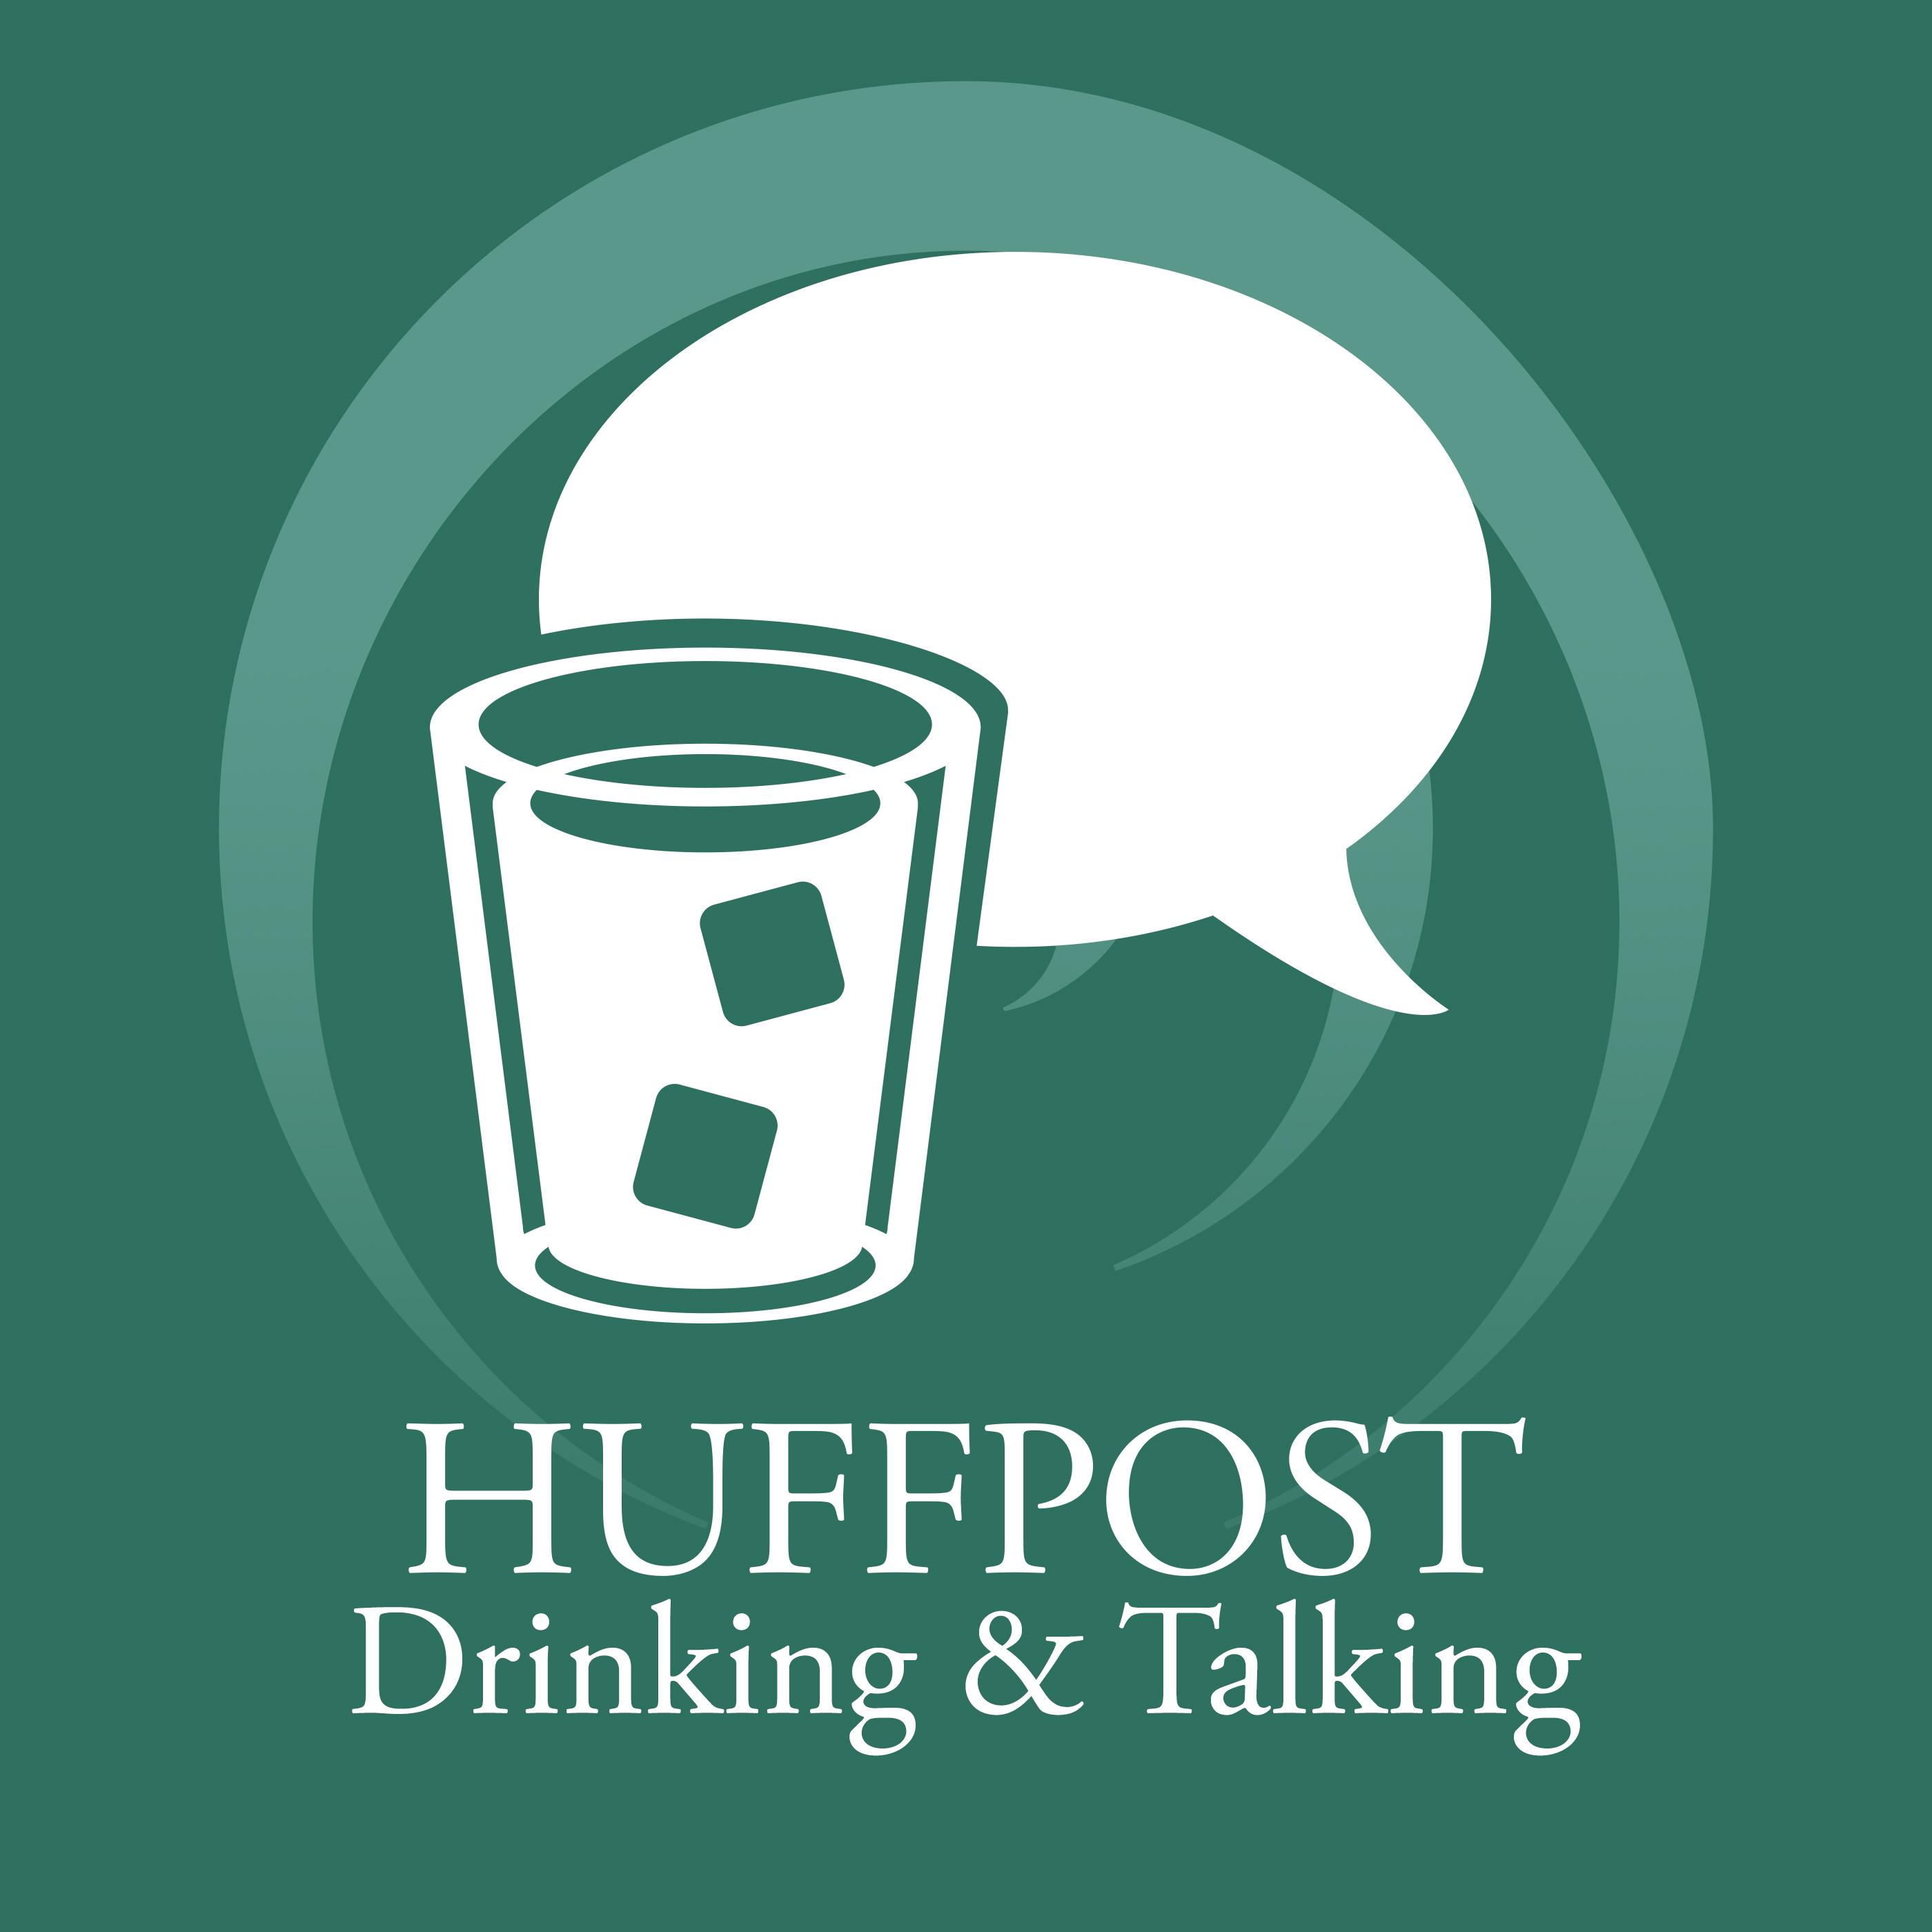 Drinking & Talking